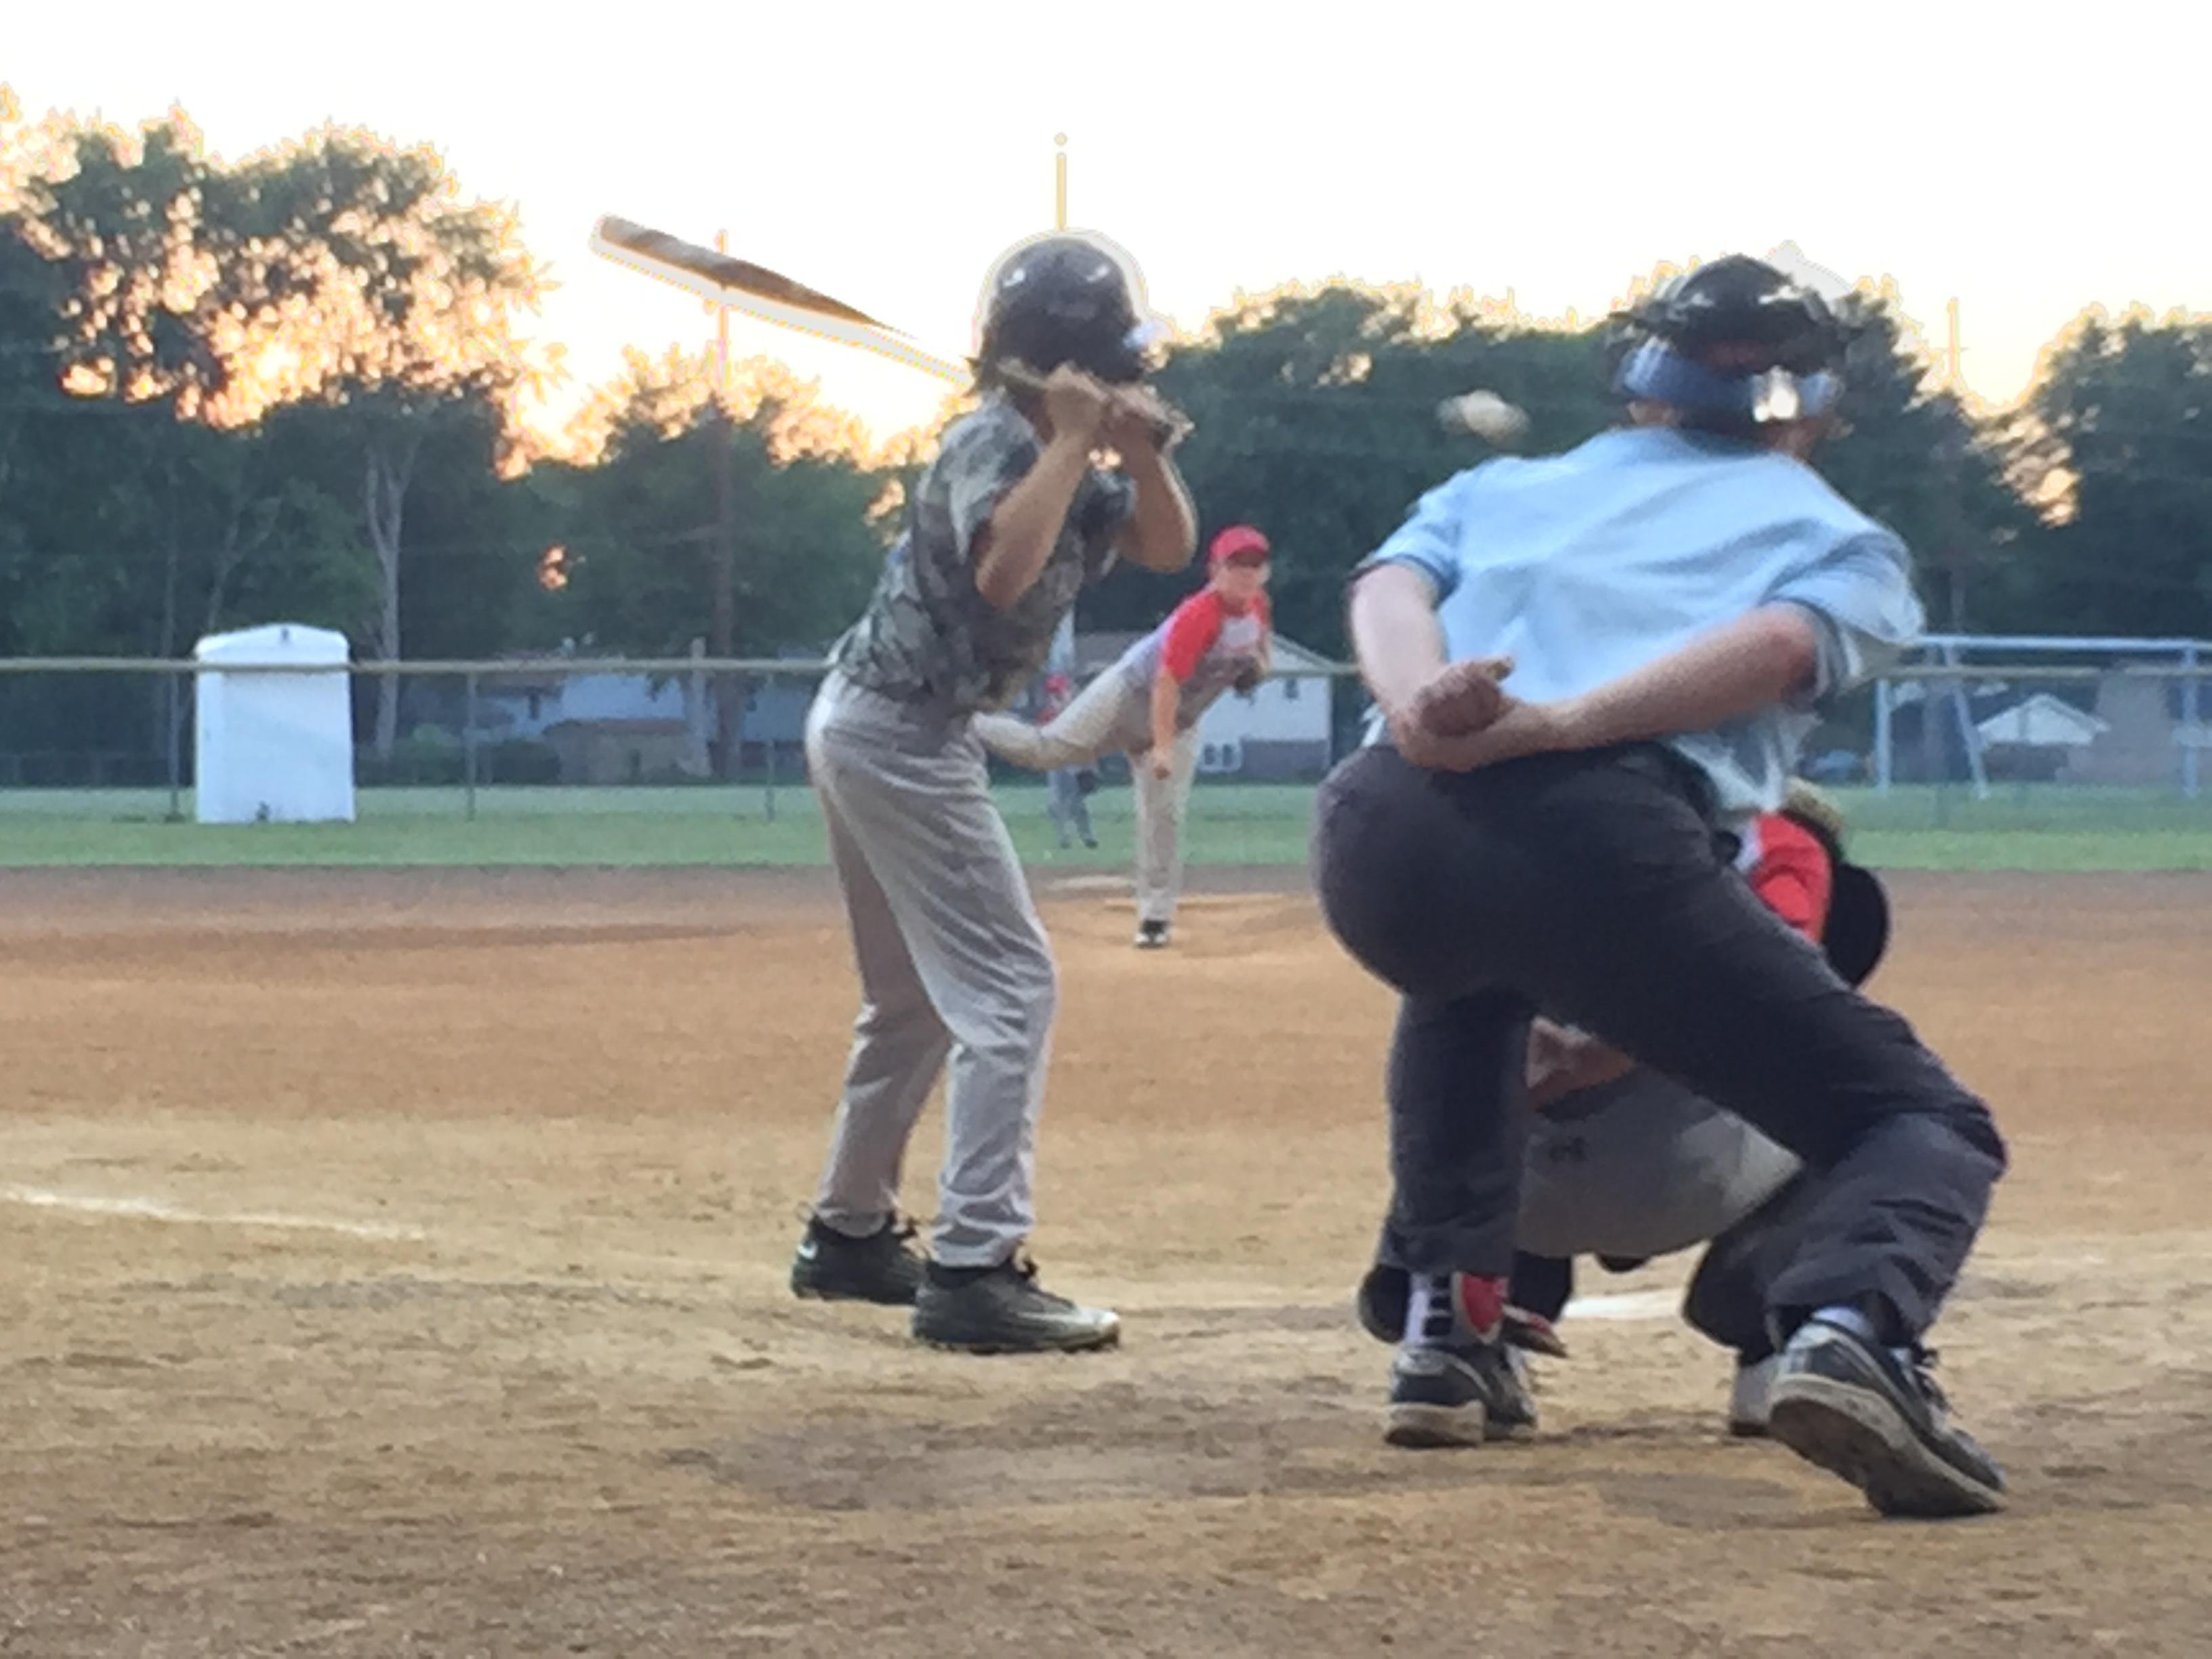 Got Dents Springfield IL, Vs Riverton Rangers of Riverton IL, Baseball Game June 18, 2016